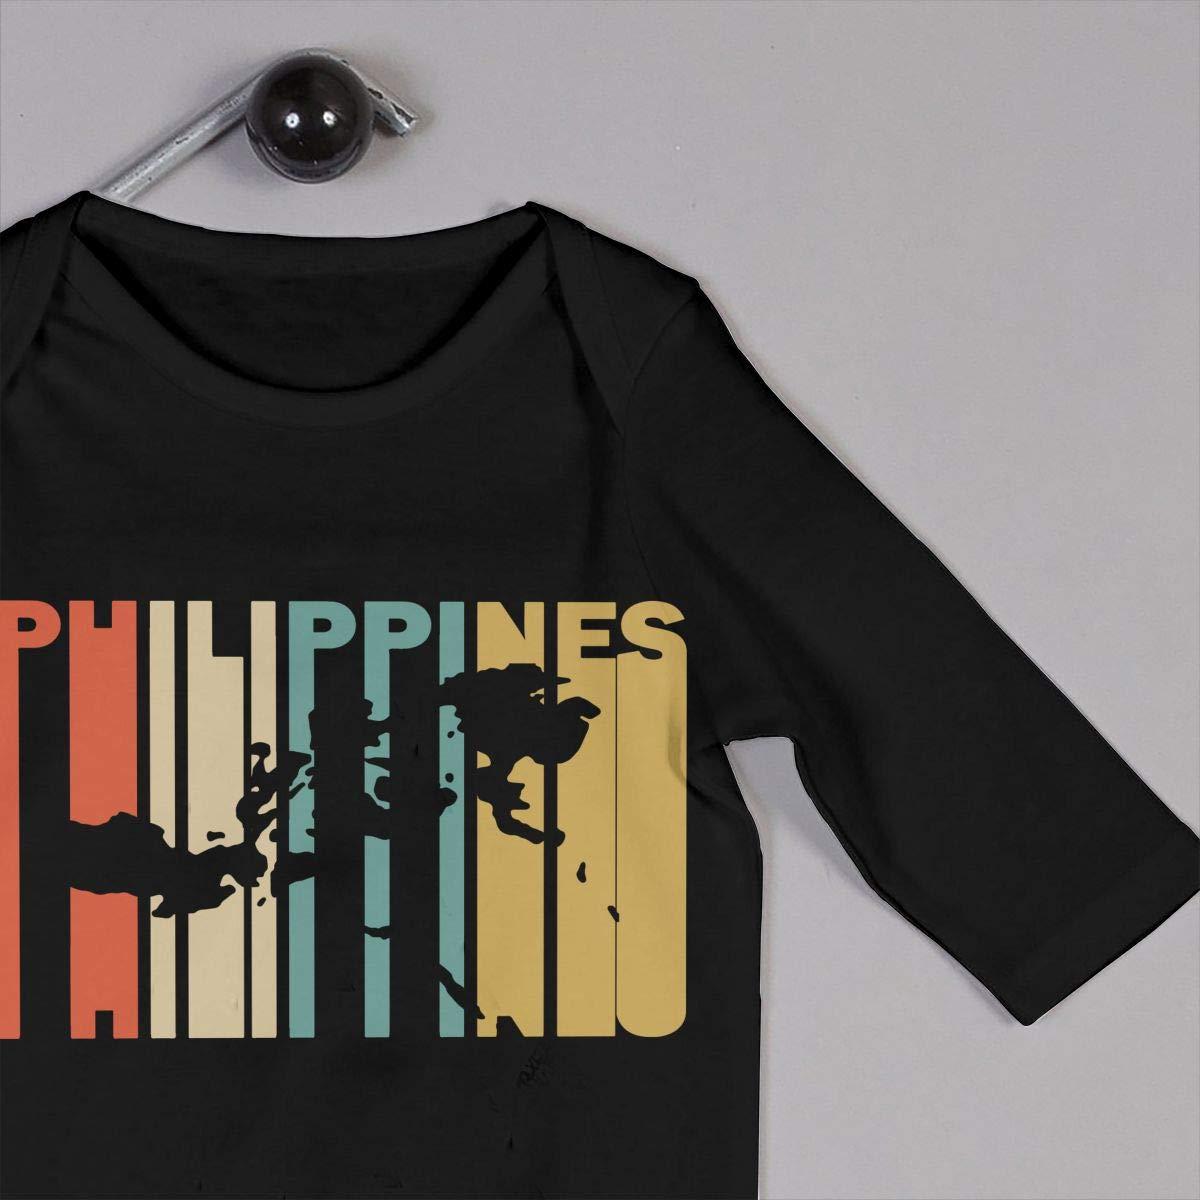 Long Sleeve Cotton Bodysuit for Unisex Baby Fashion Retro Style The Philippines Silhouette Crawler Black